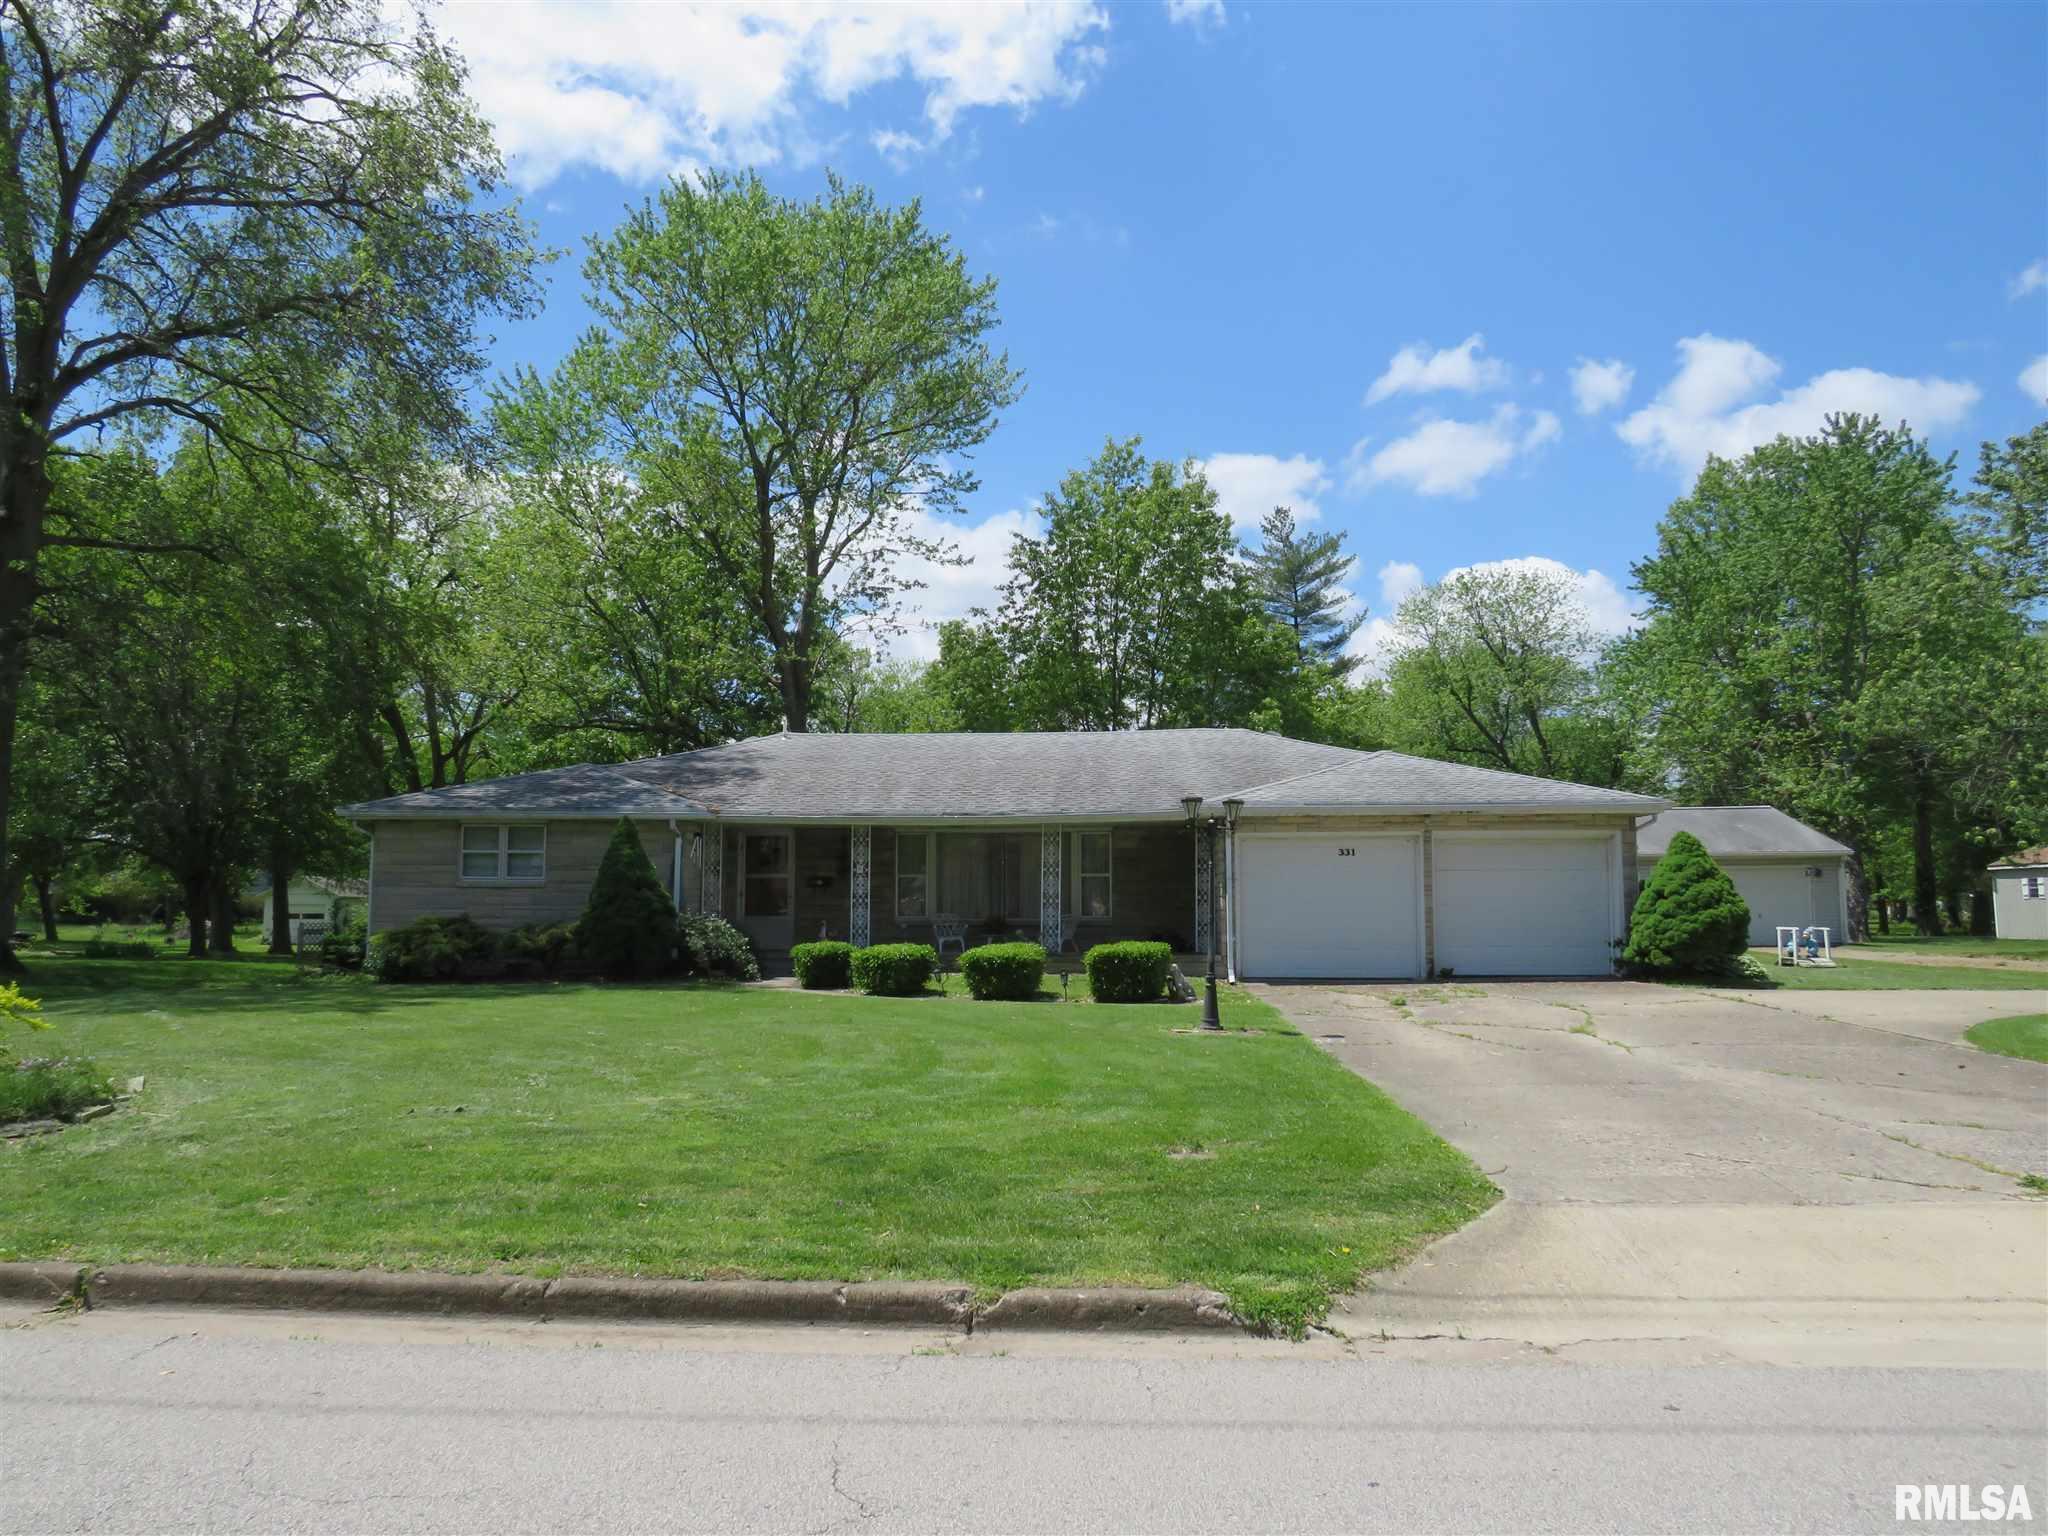 331 ILLINOIS Property Photo - Salem, IL real estate listing